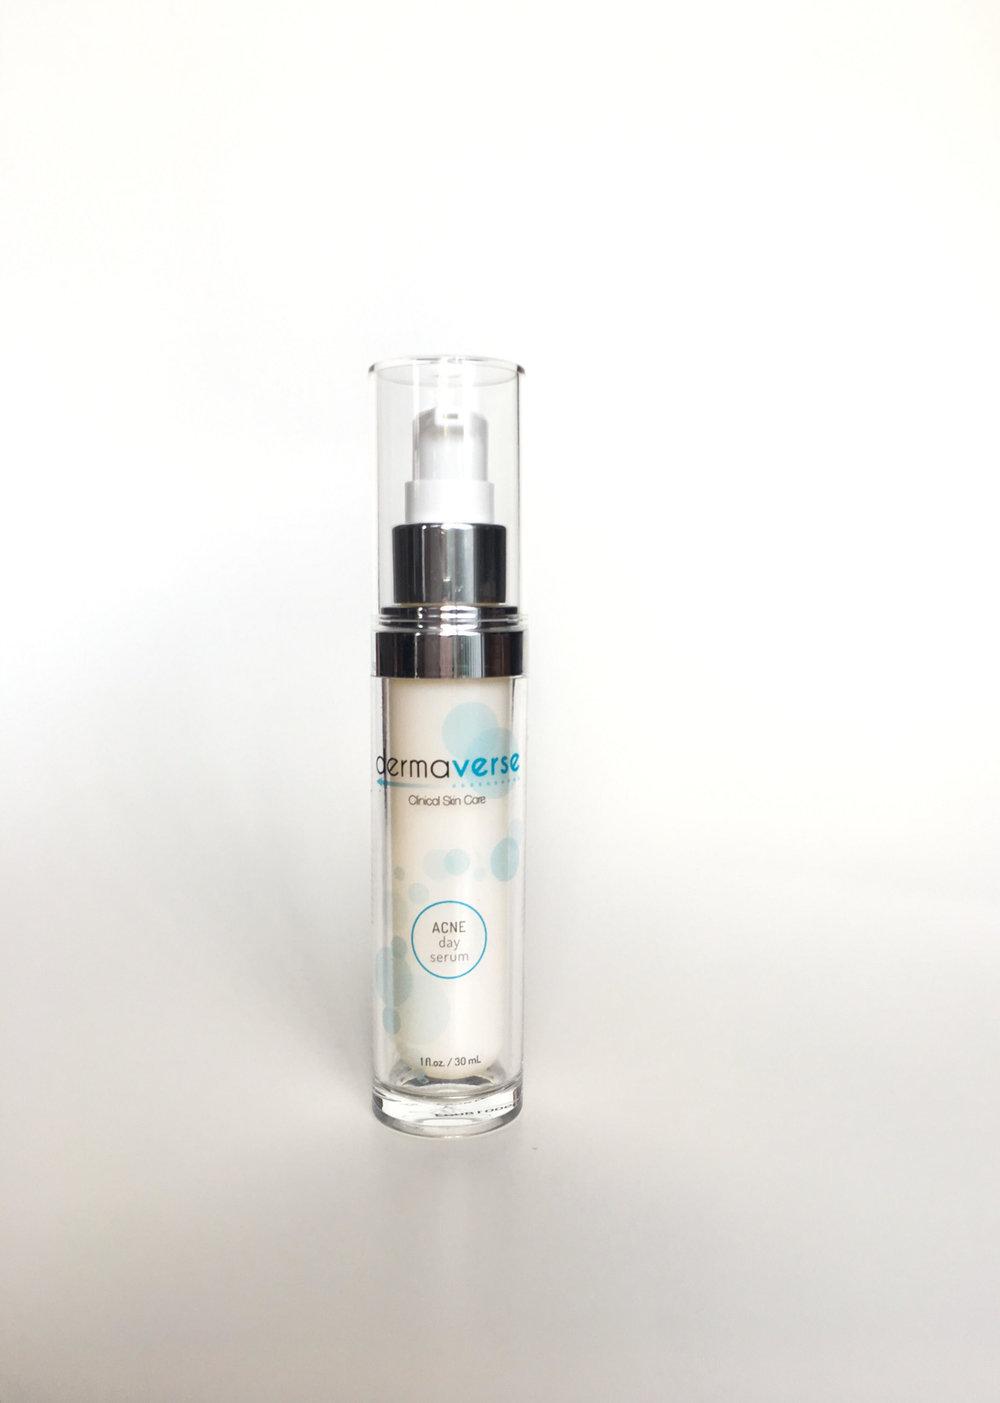 Acne Day Serum $55